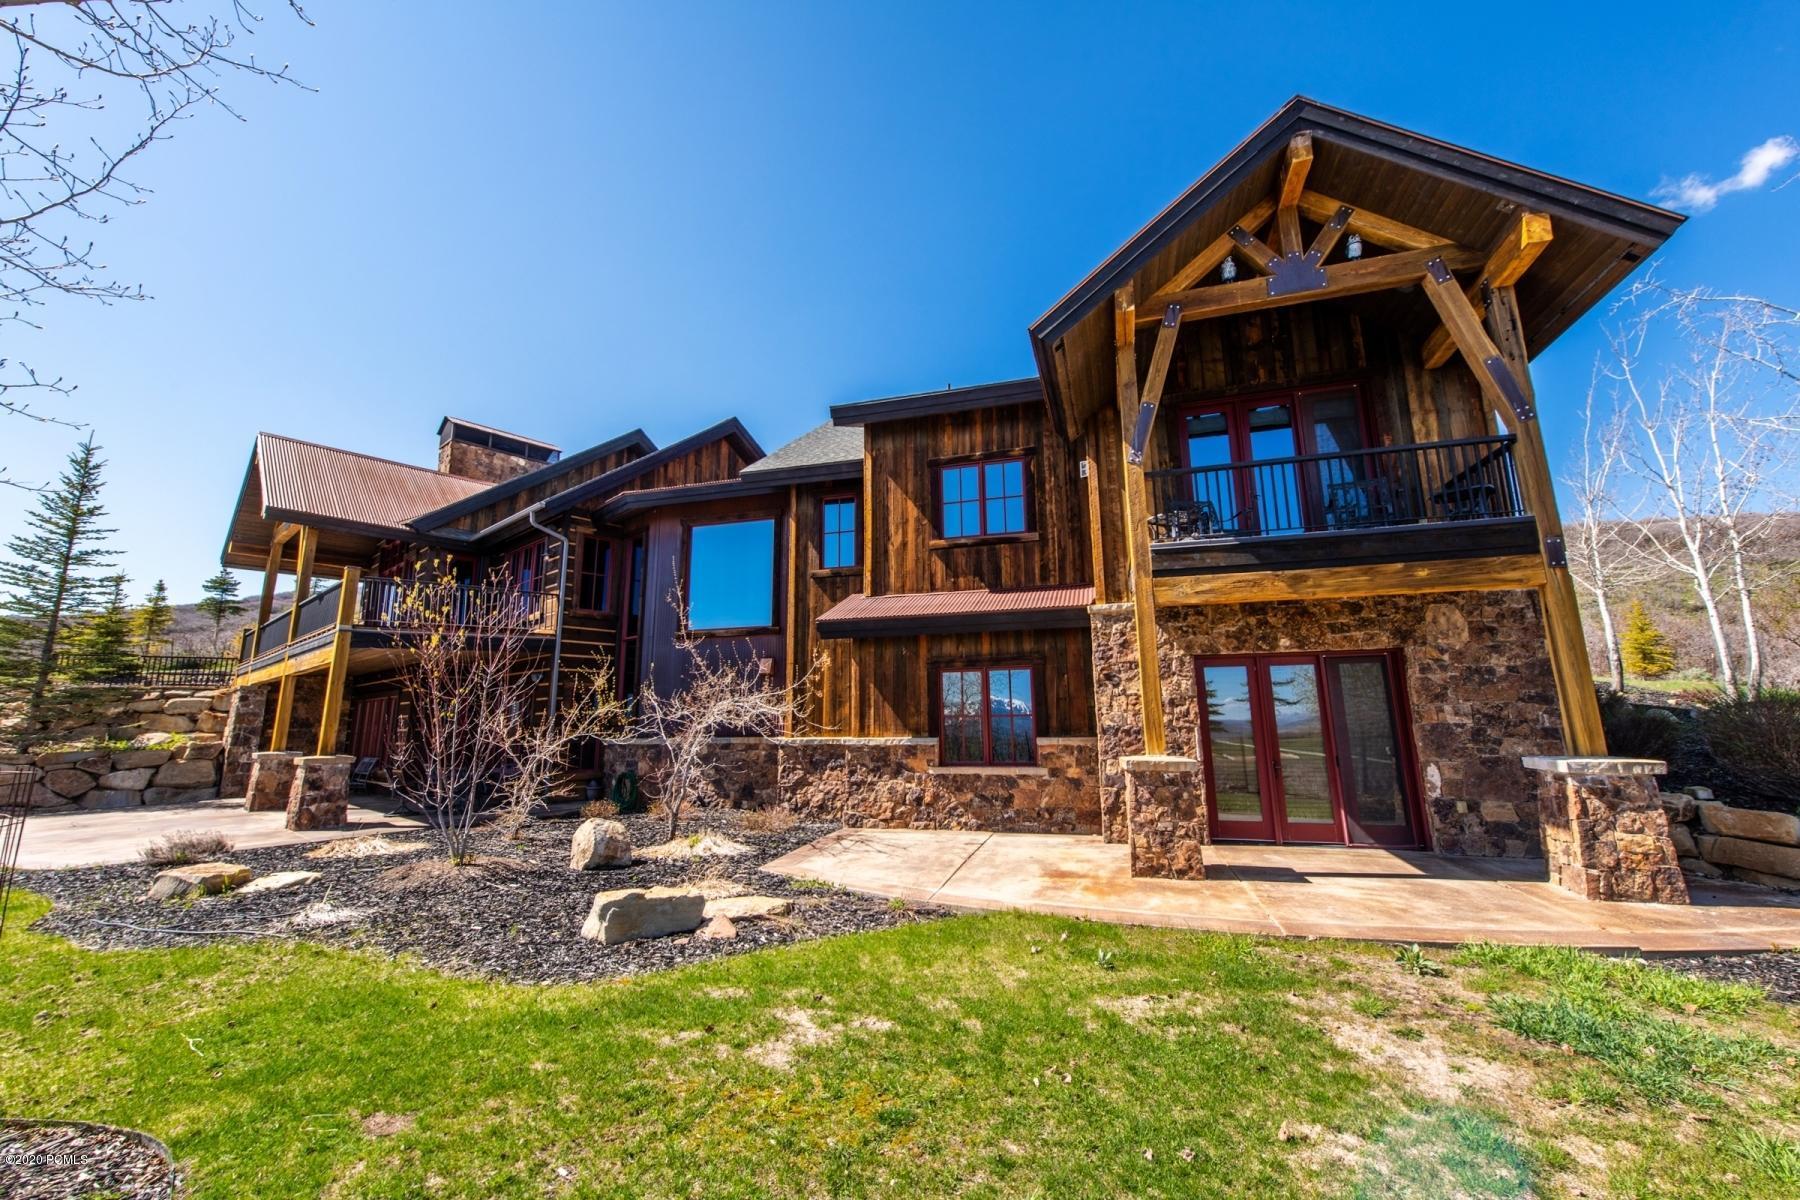 376 West Deer Hill Road, Park City, Utah 84098, 5 Bedrooms Bedrooms, ,8 BathroomsBathrooms,Single Family,For Sale,West Deer Hill,12000726